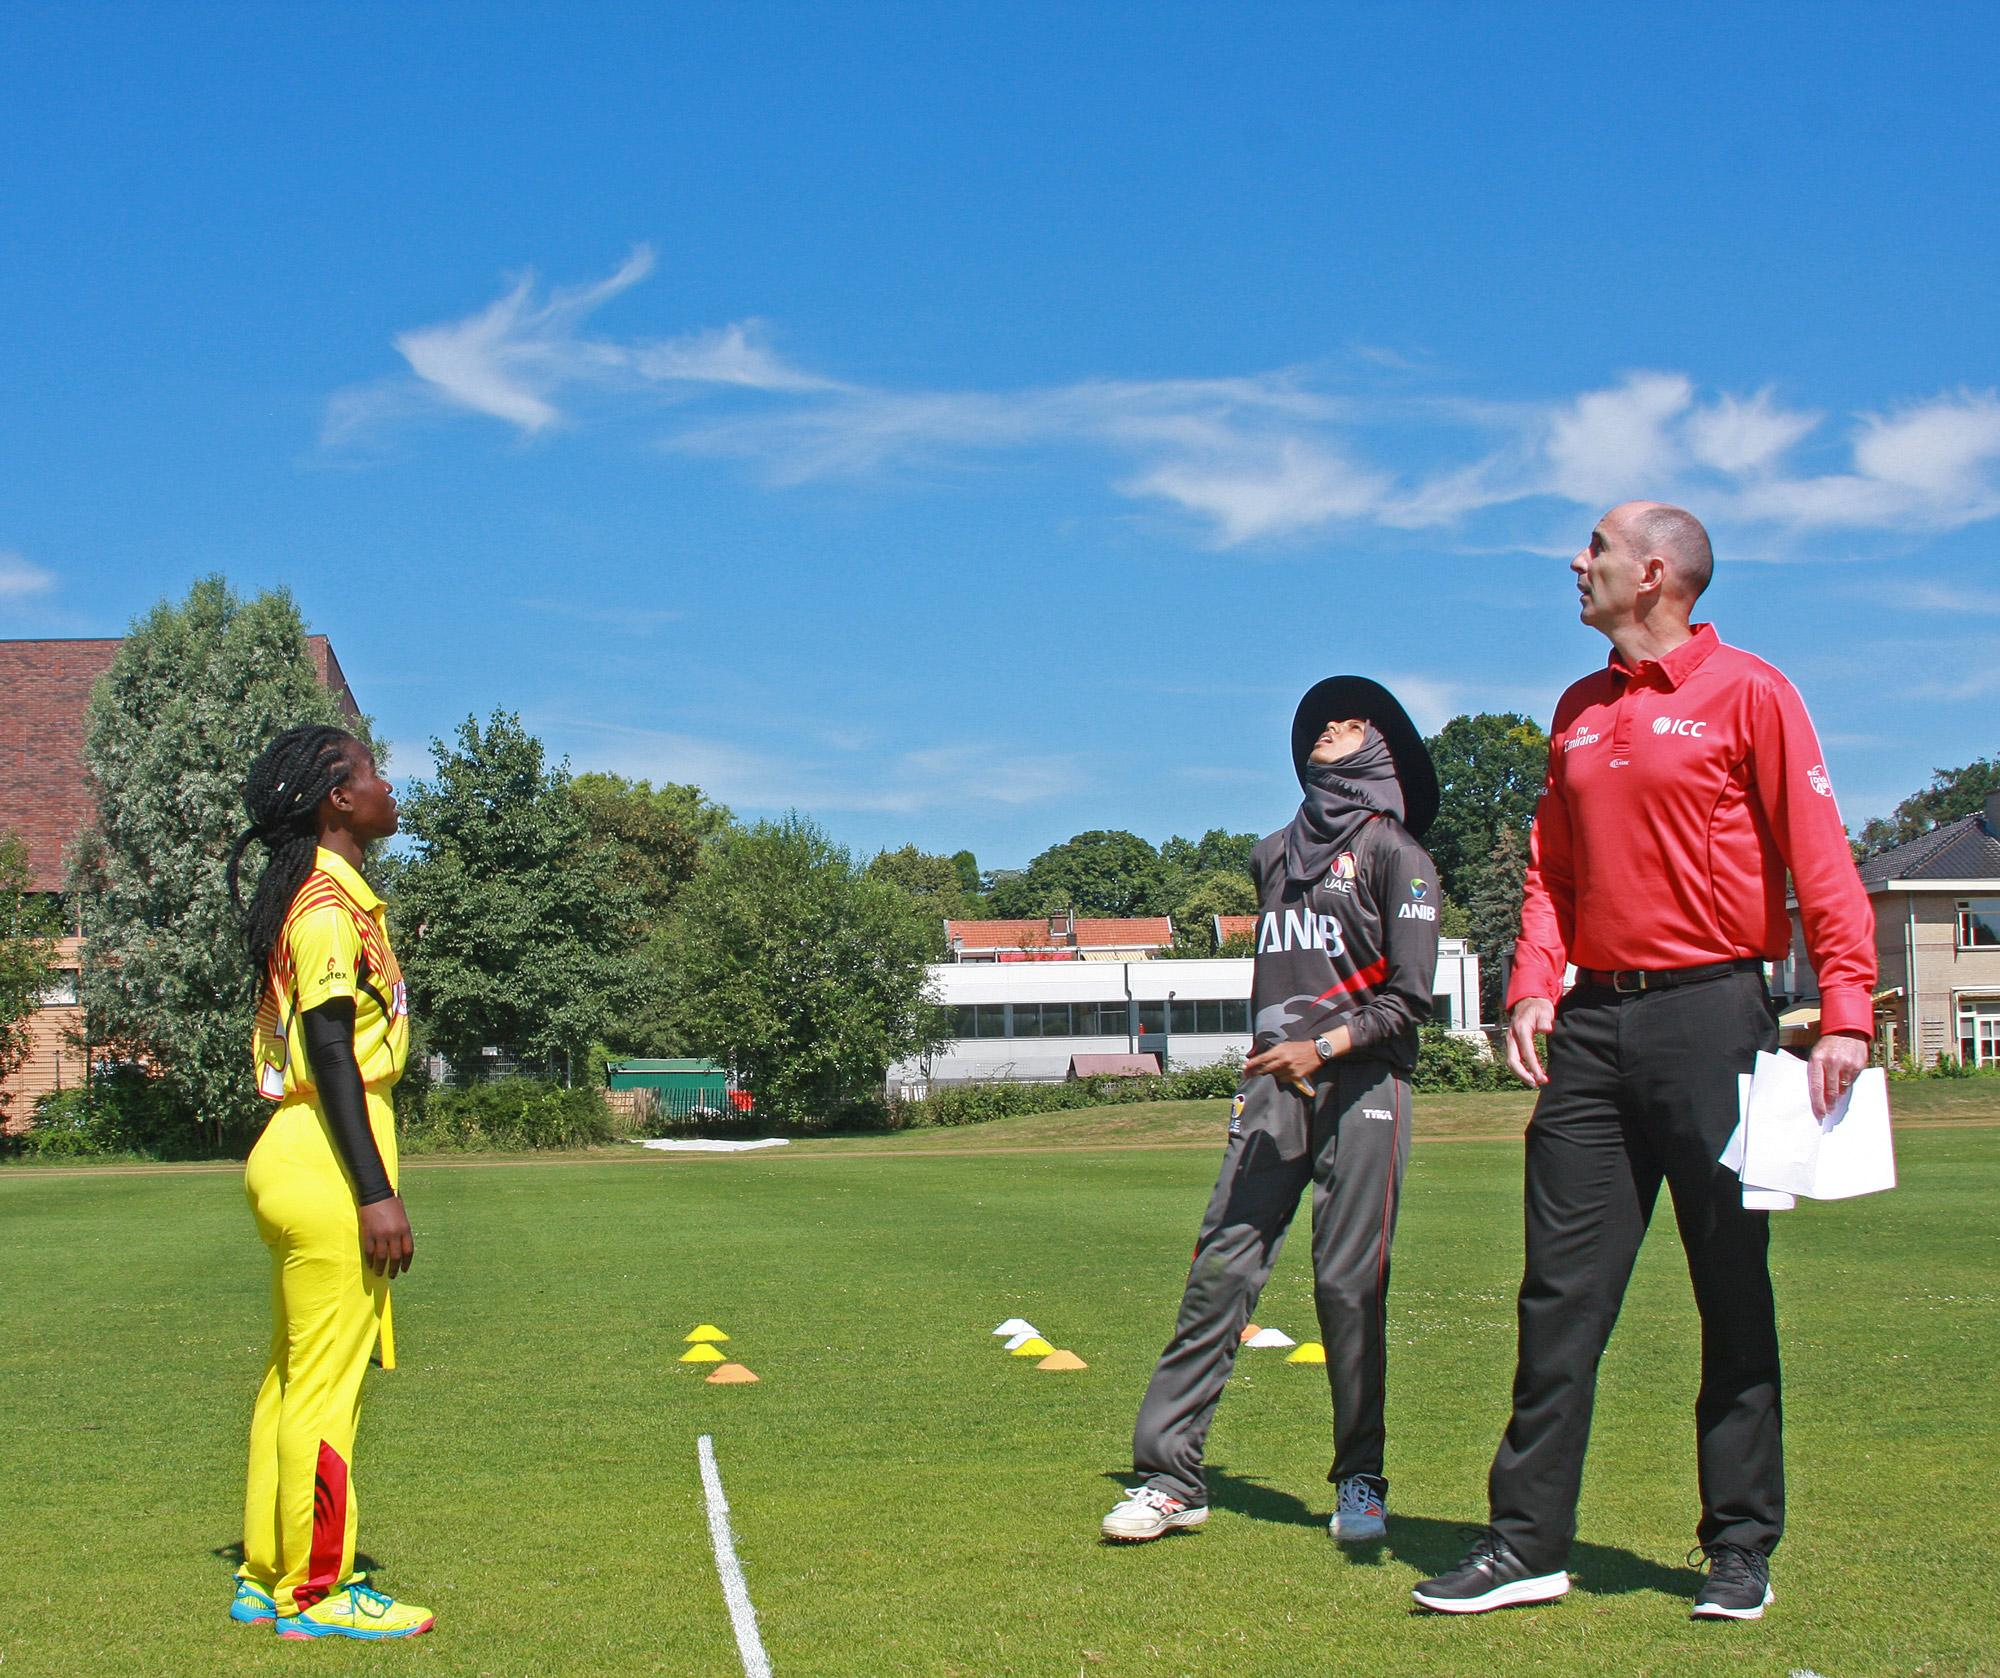 Uae Women V Uganda Women Icc Women S World Twenty20